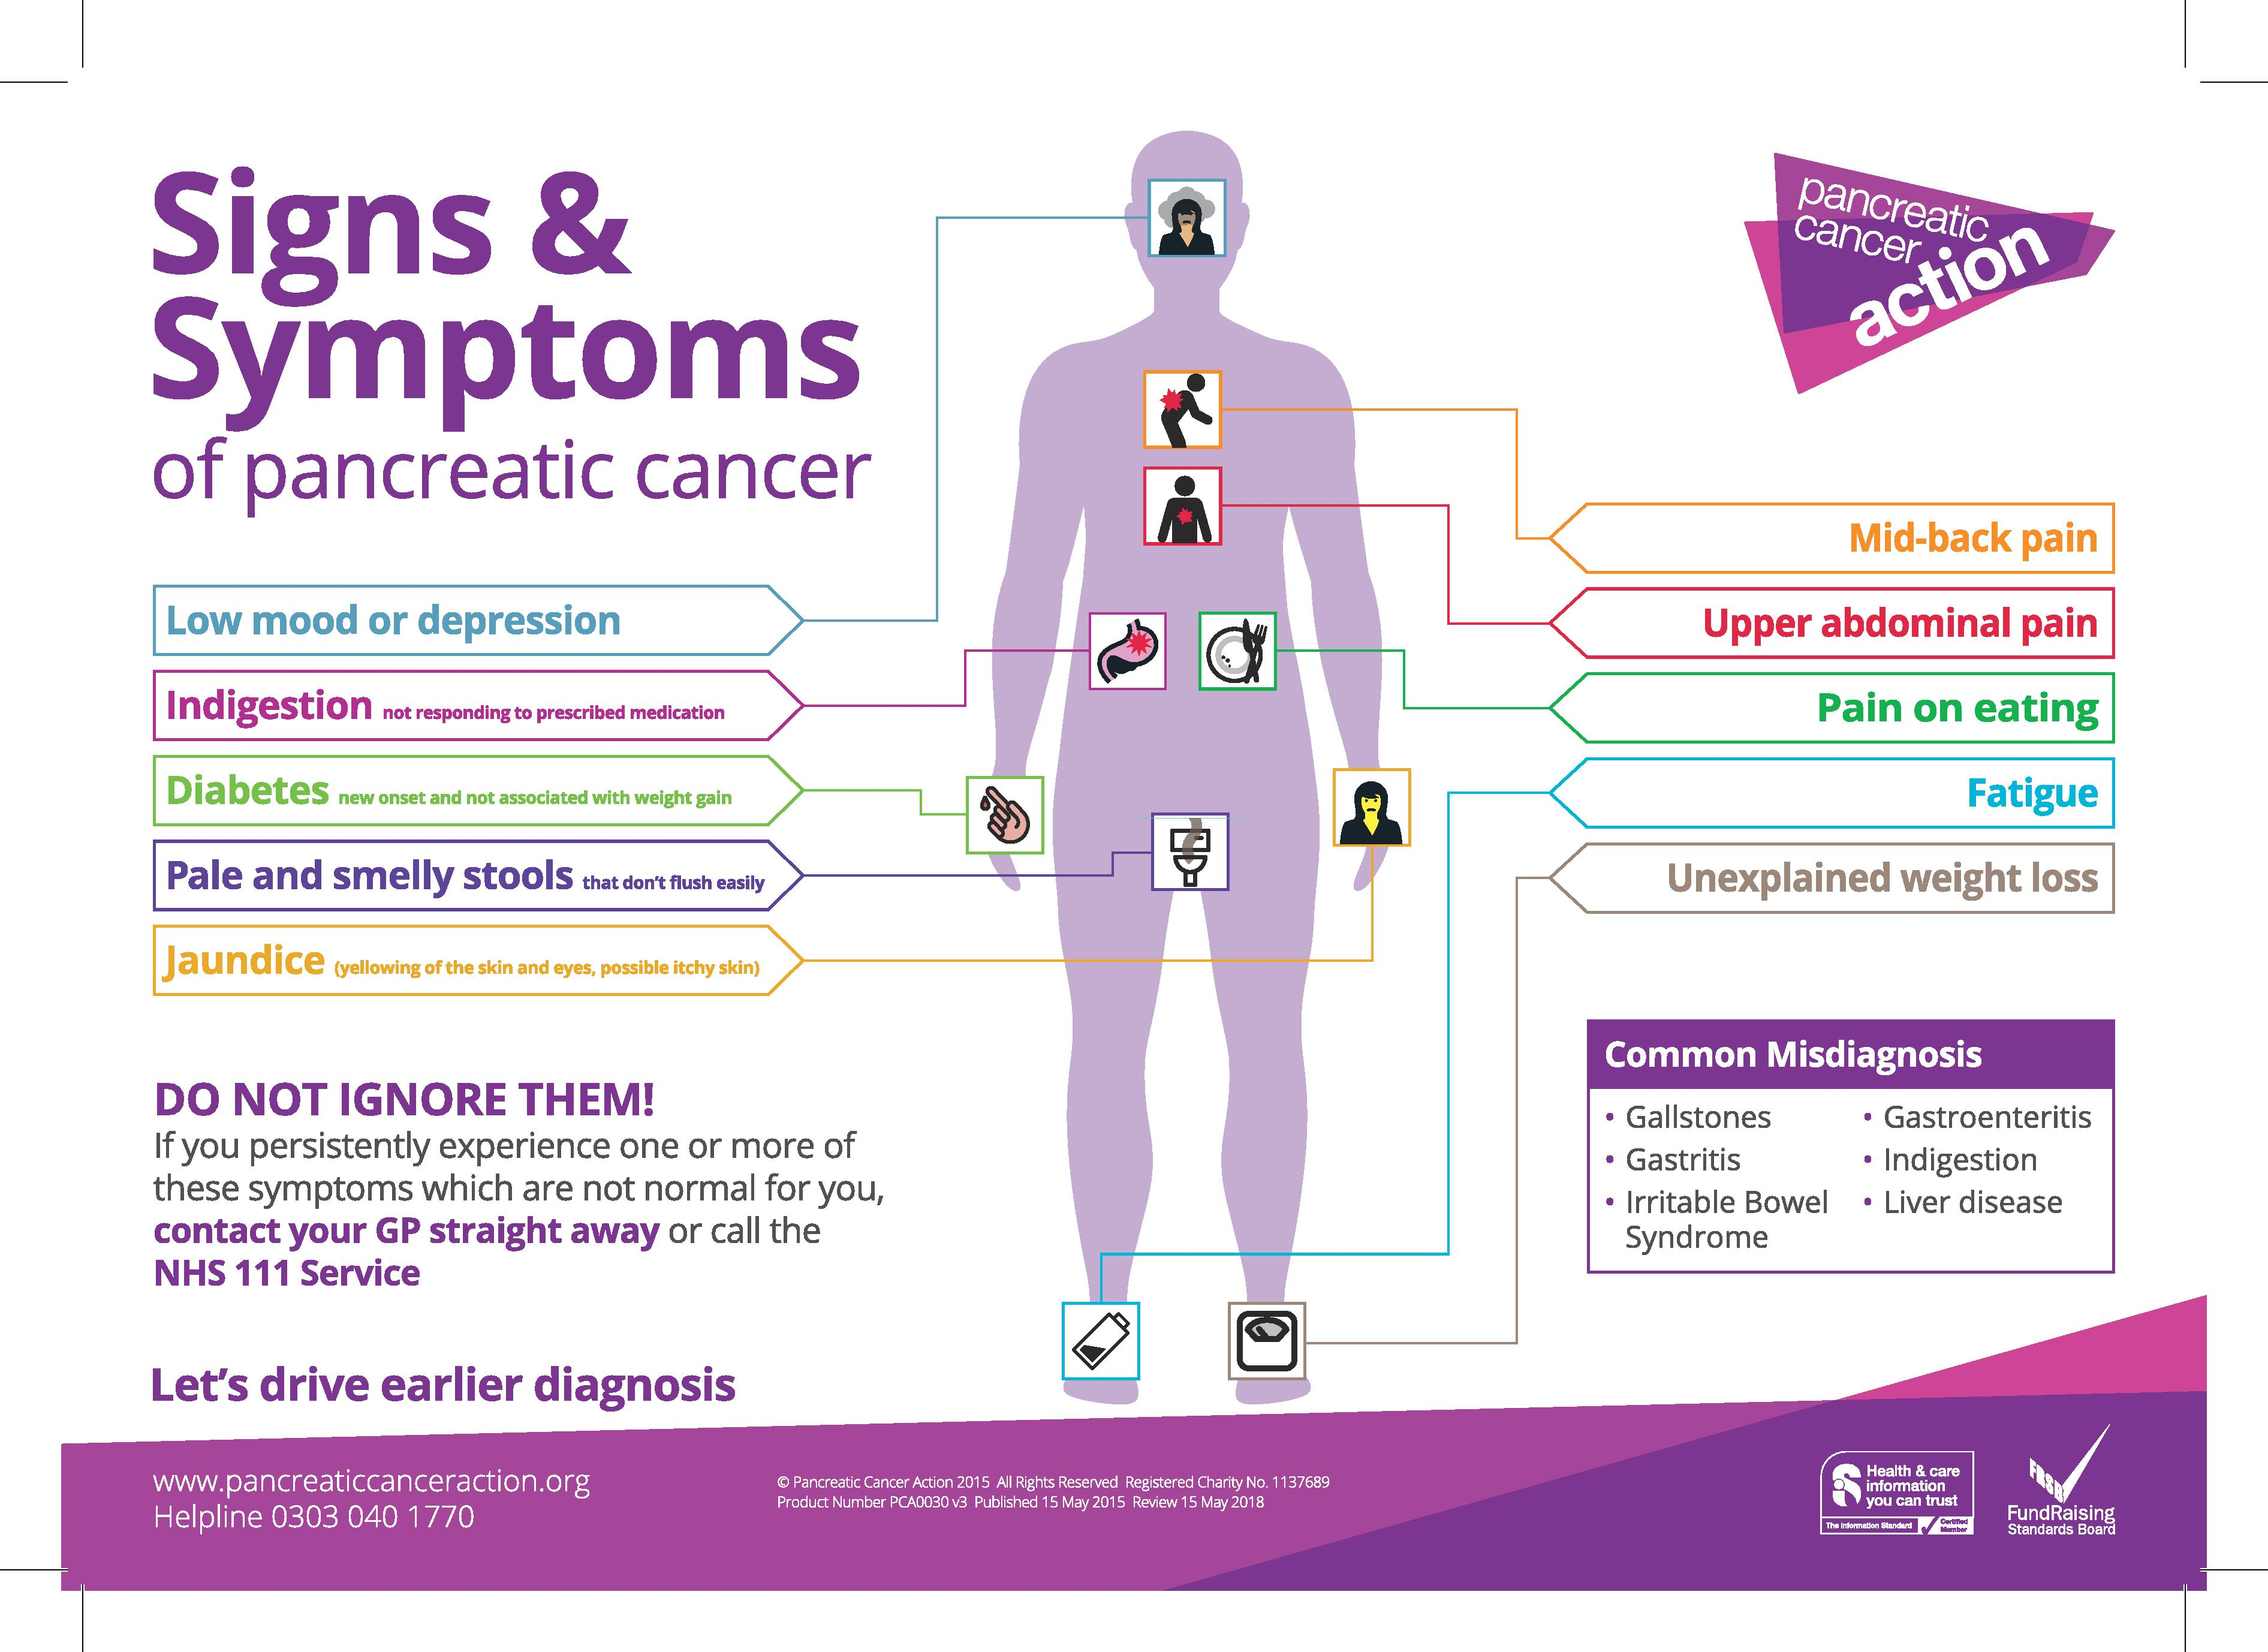 endometrial cancer before menopause pești de aur inelari